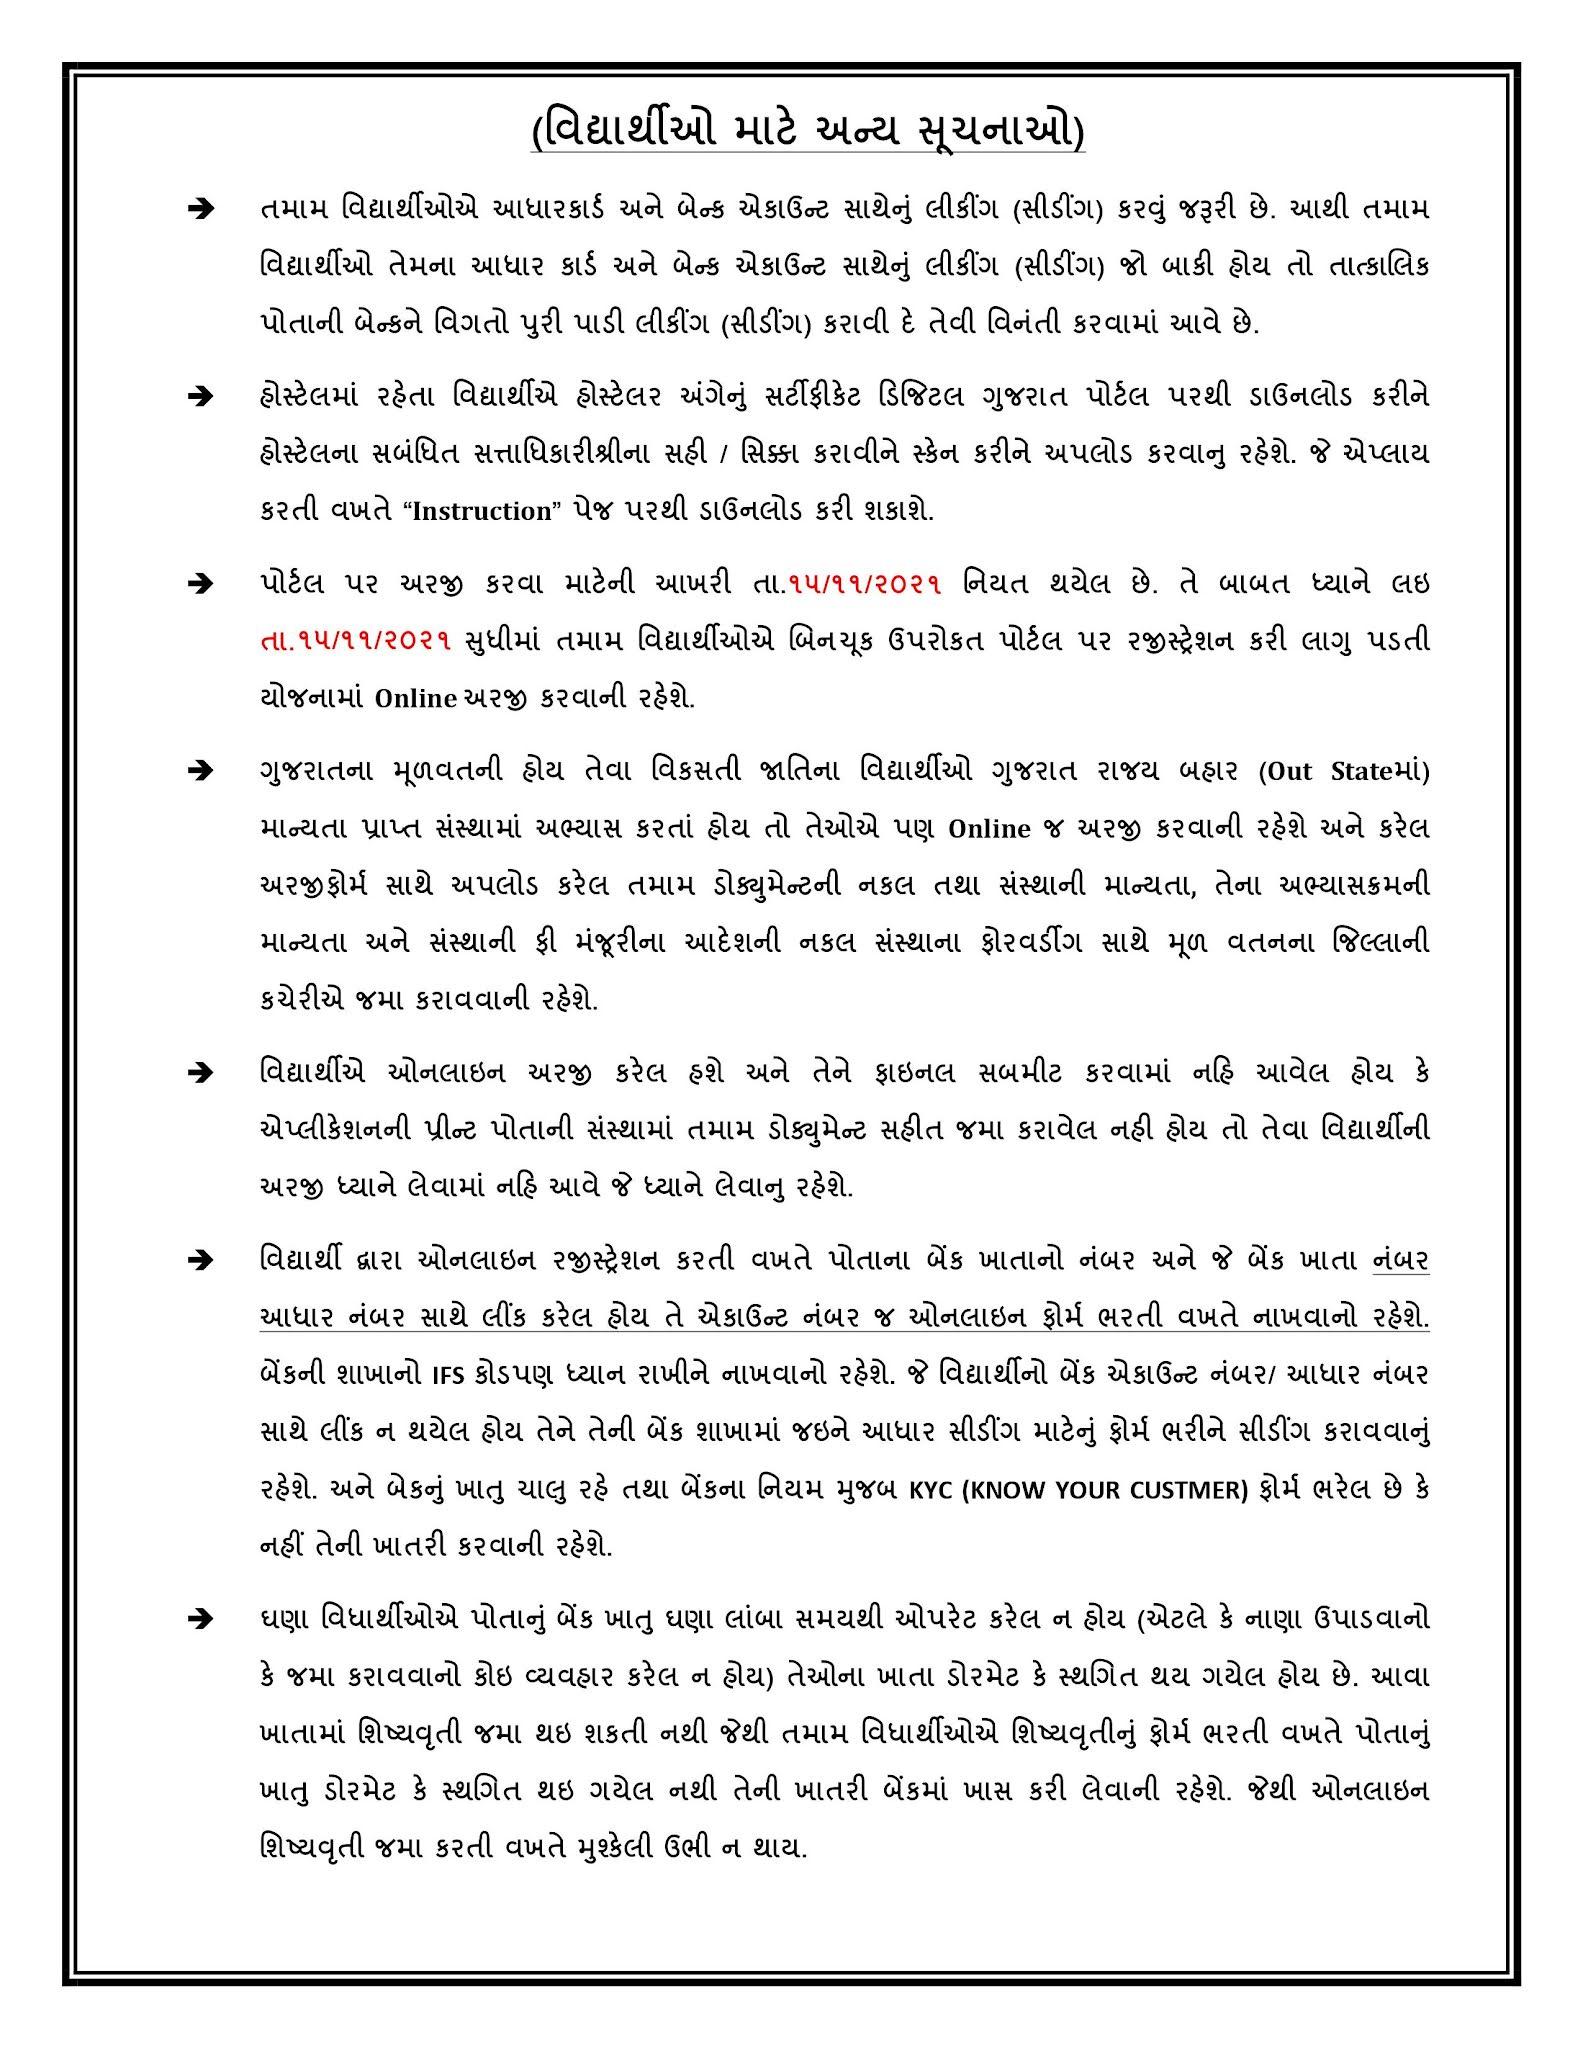 about Digital Gujarat Scholarship